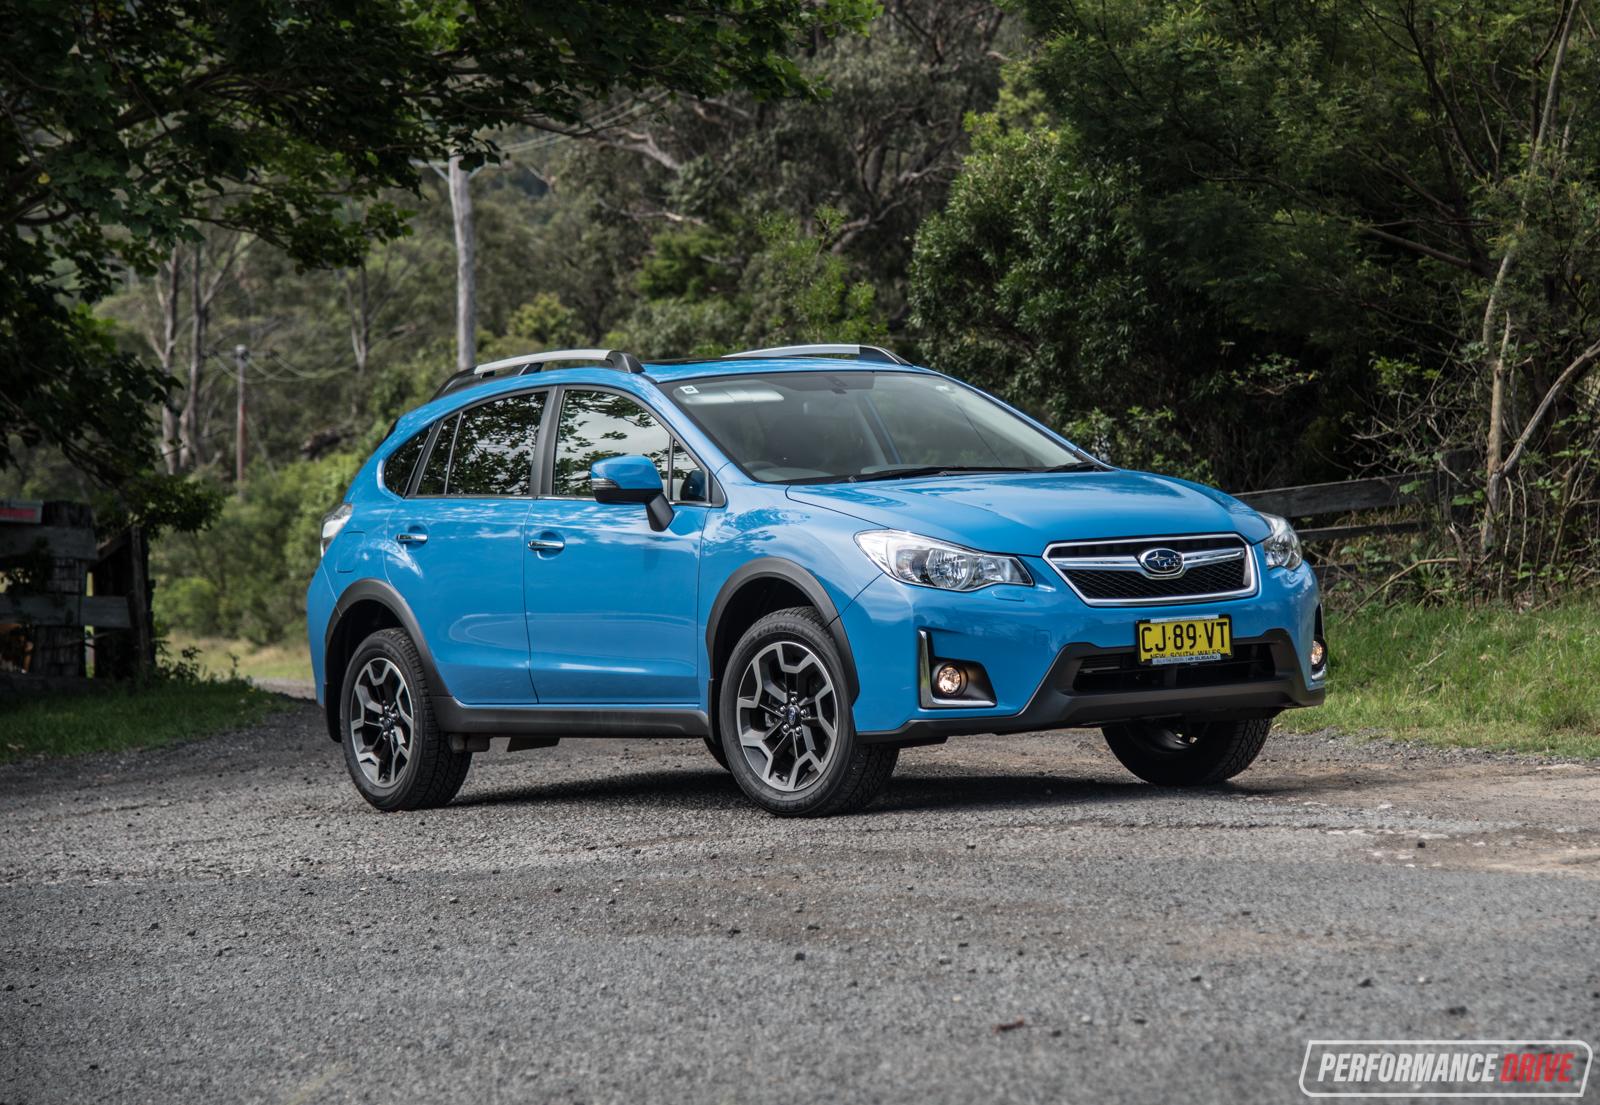 Subaru Crosstrek Offroad >> 2017 Subaru XV 2.0i-S review (video) | PerformanceDrive